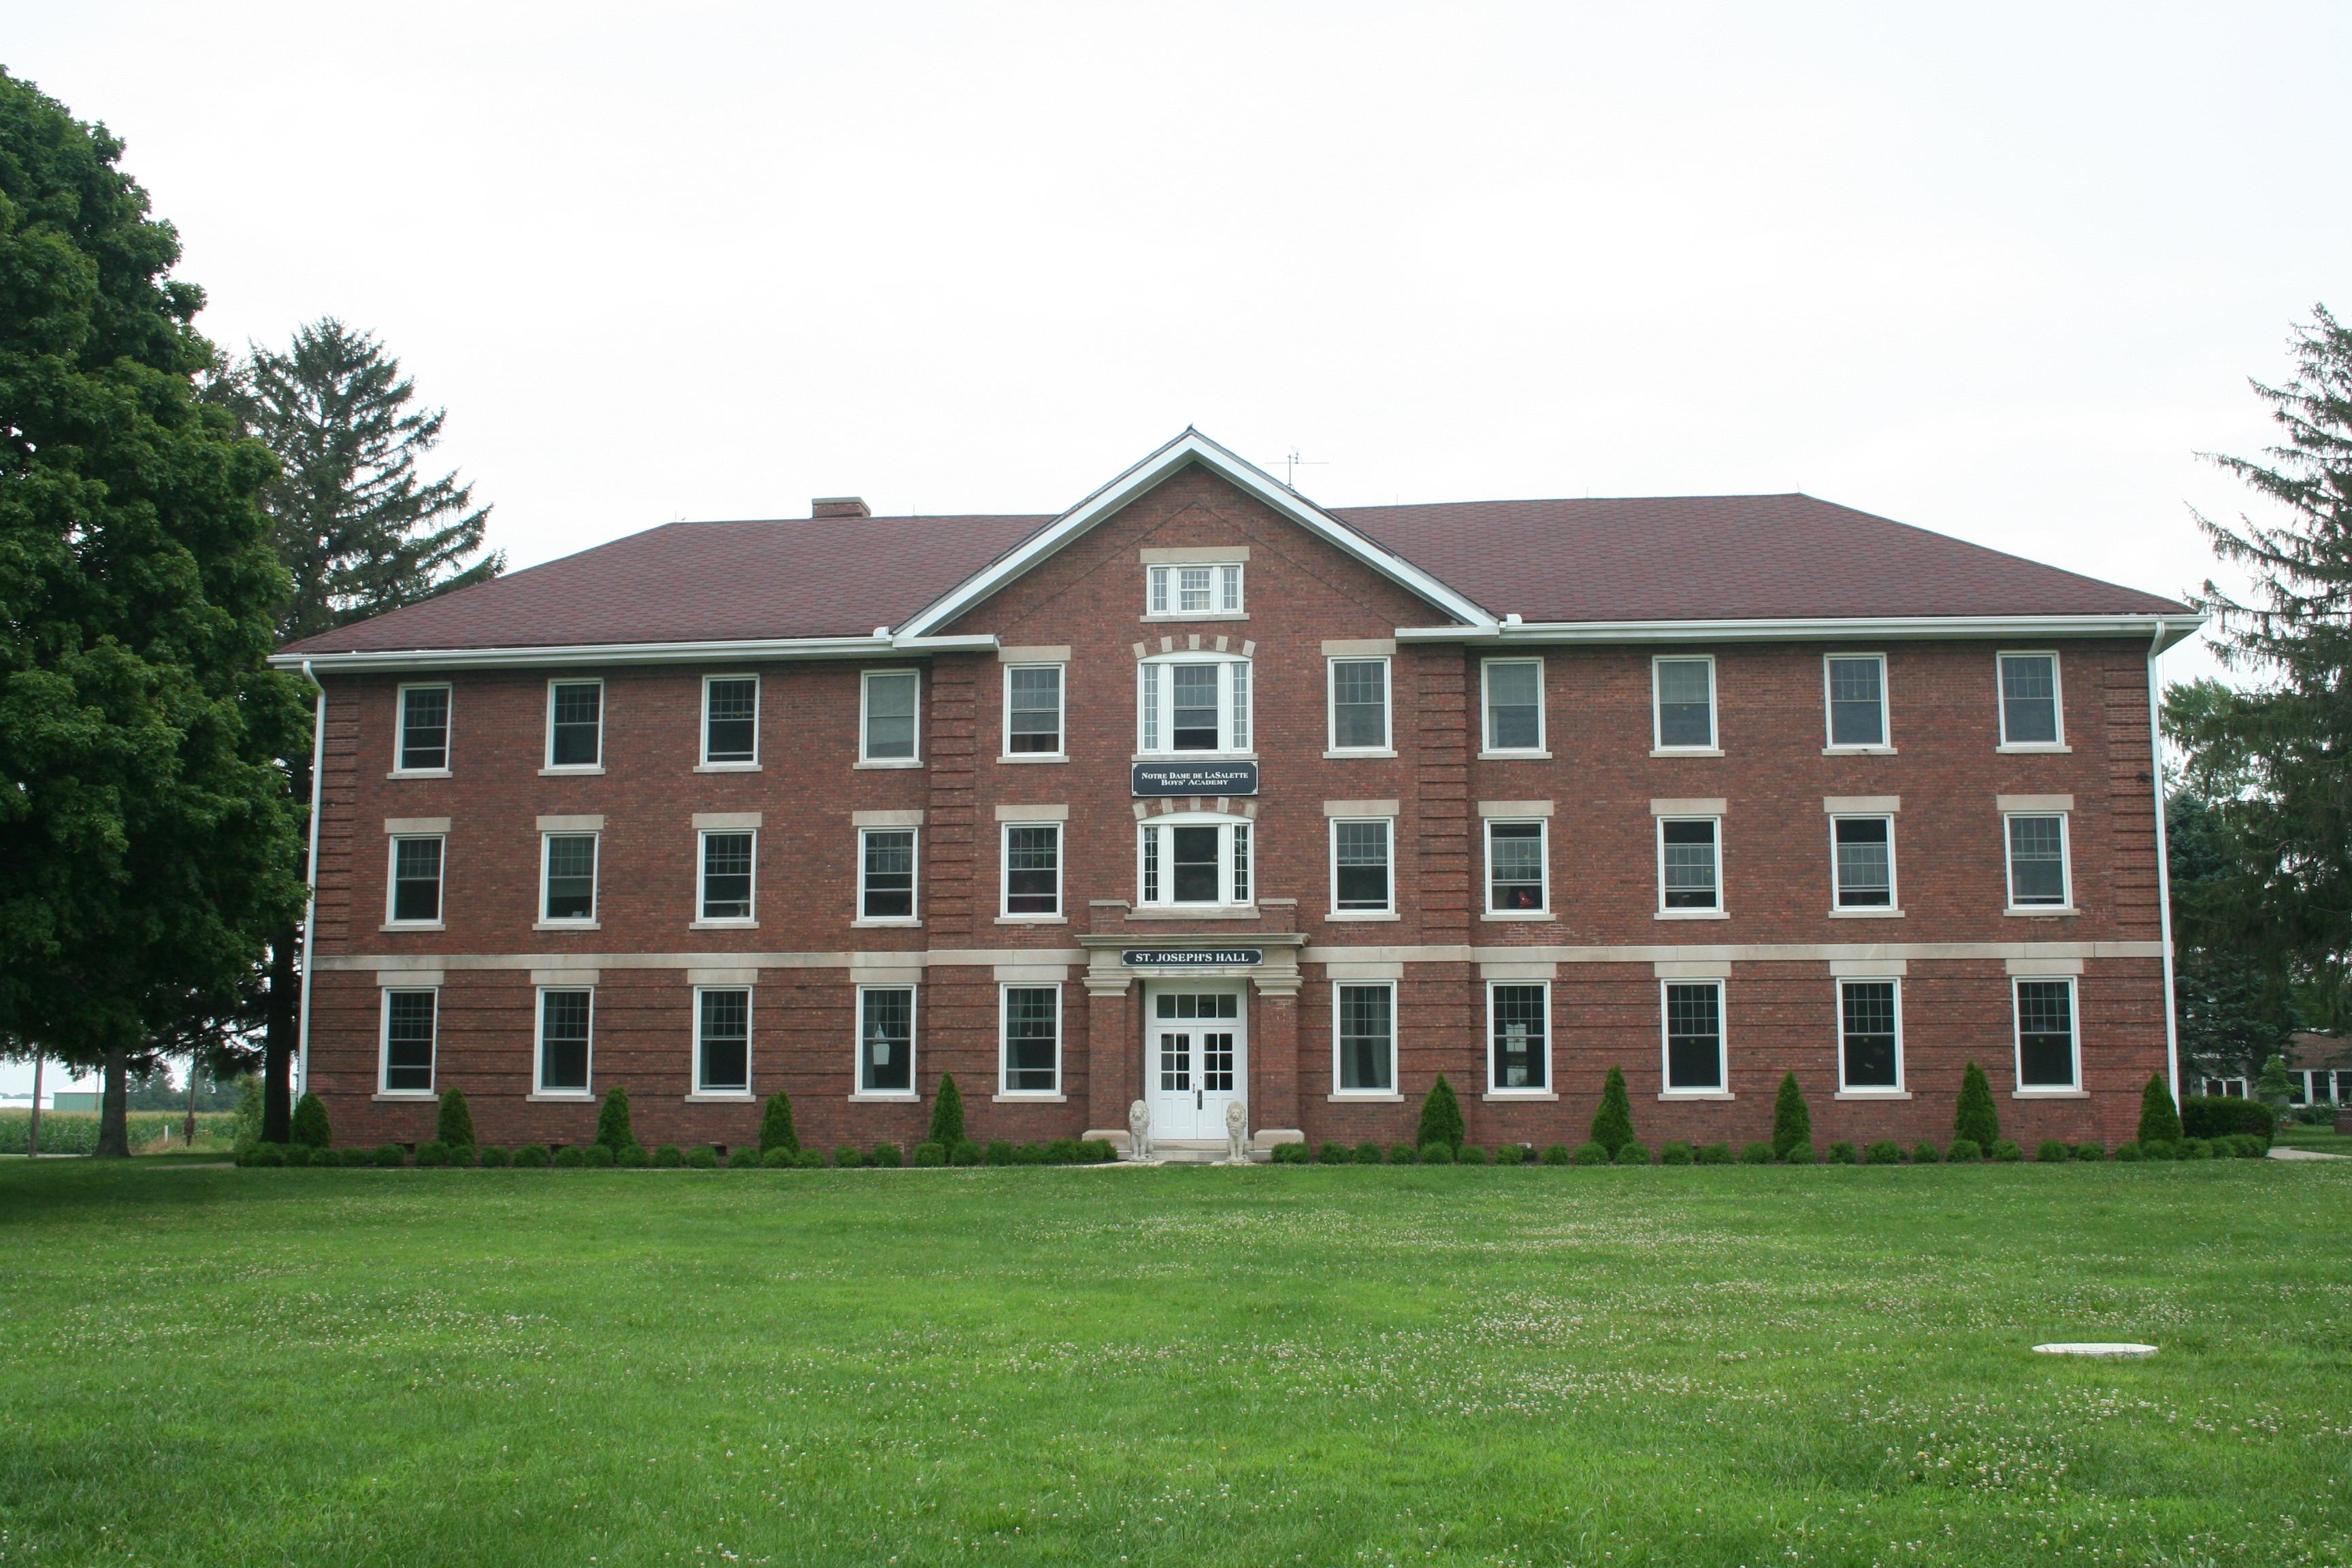 St. Joseph's Dormitory